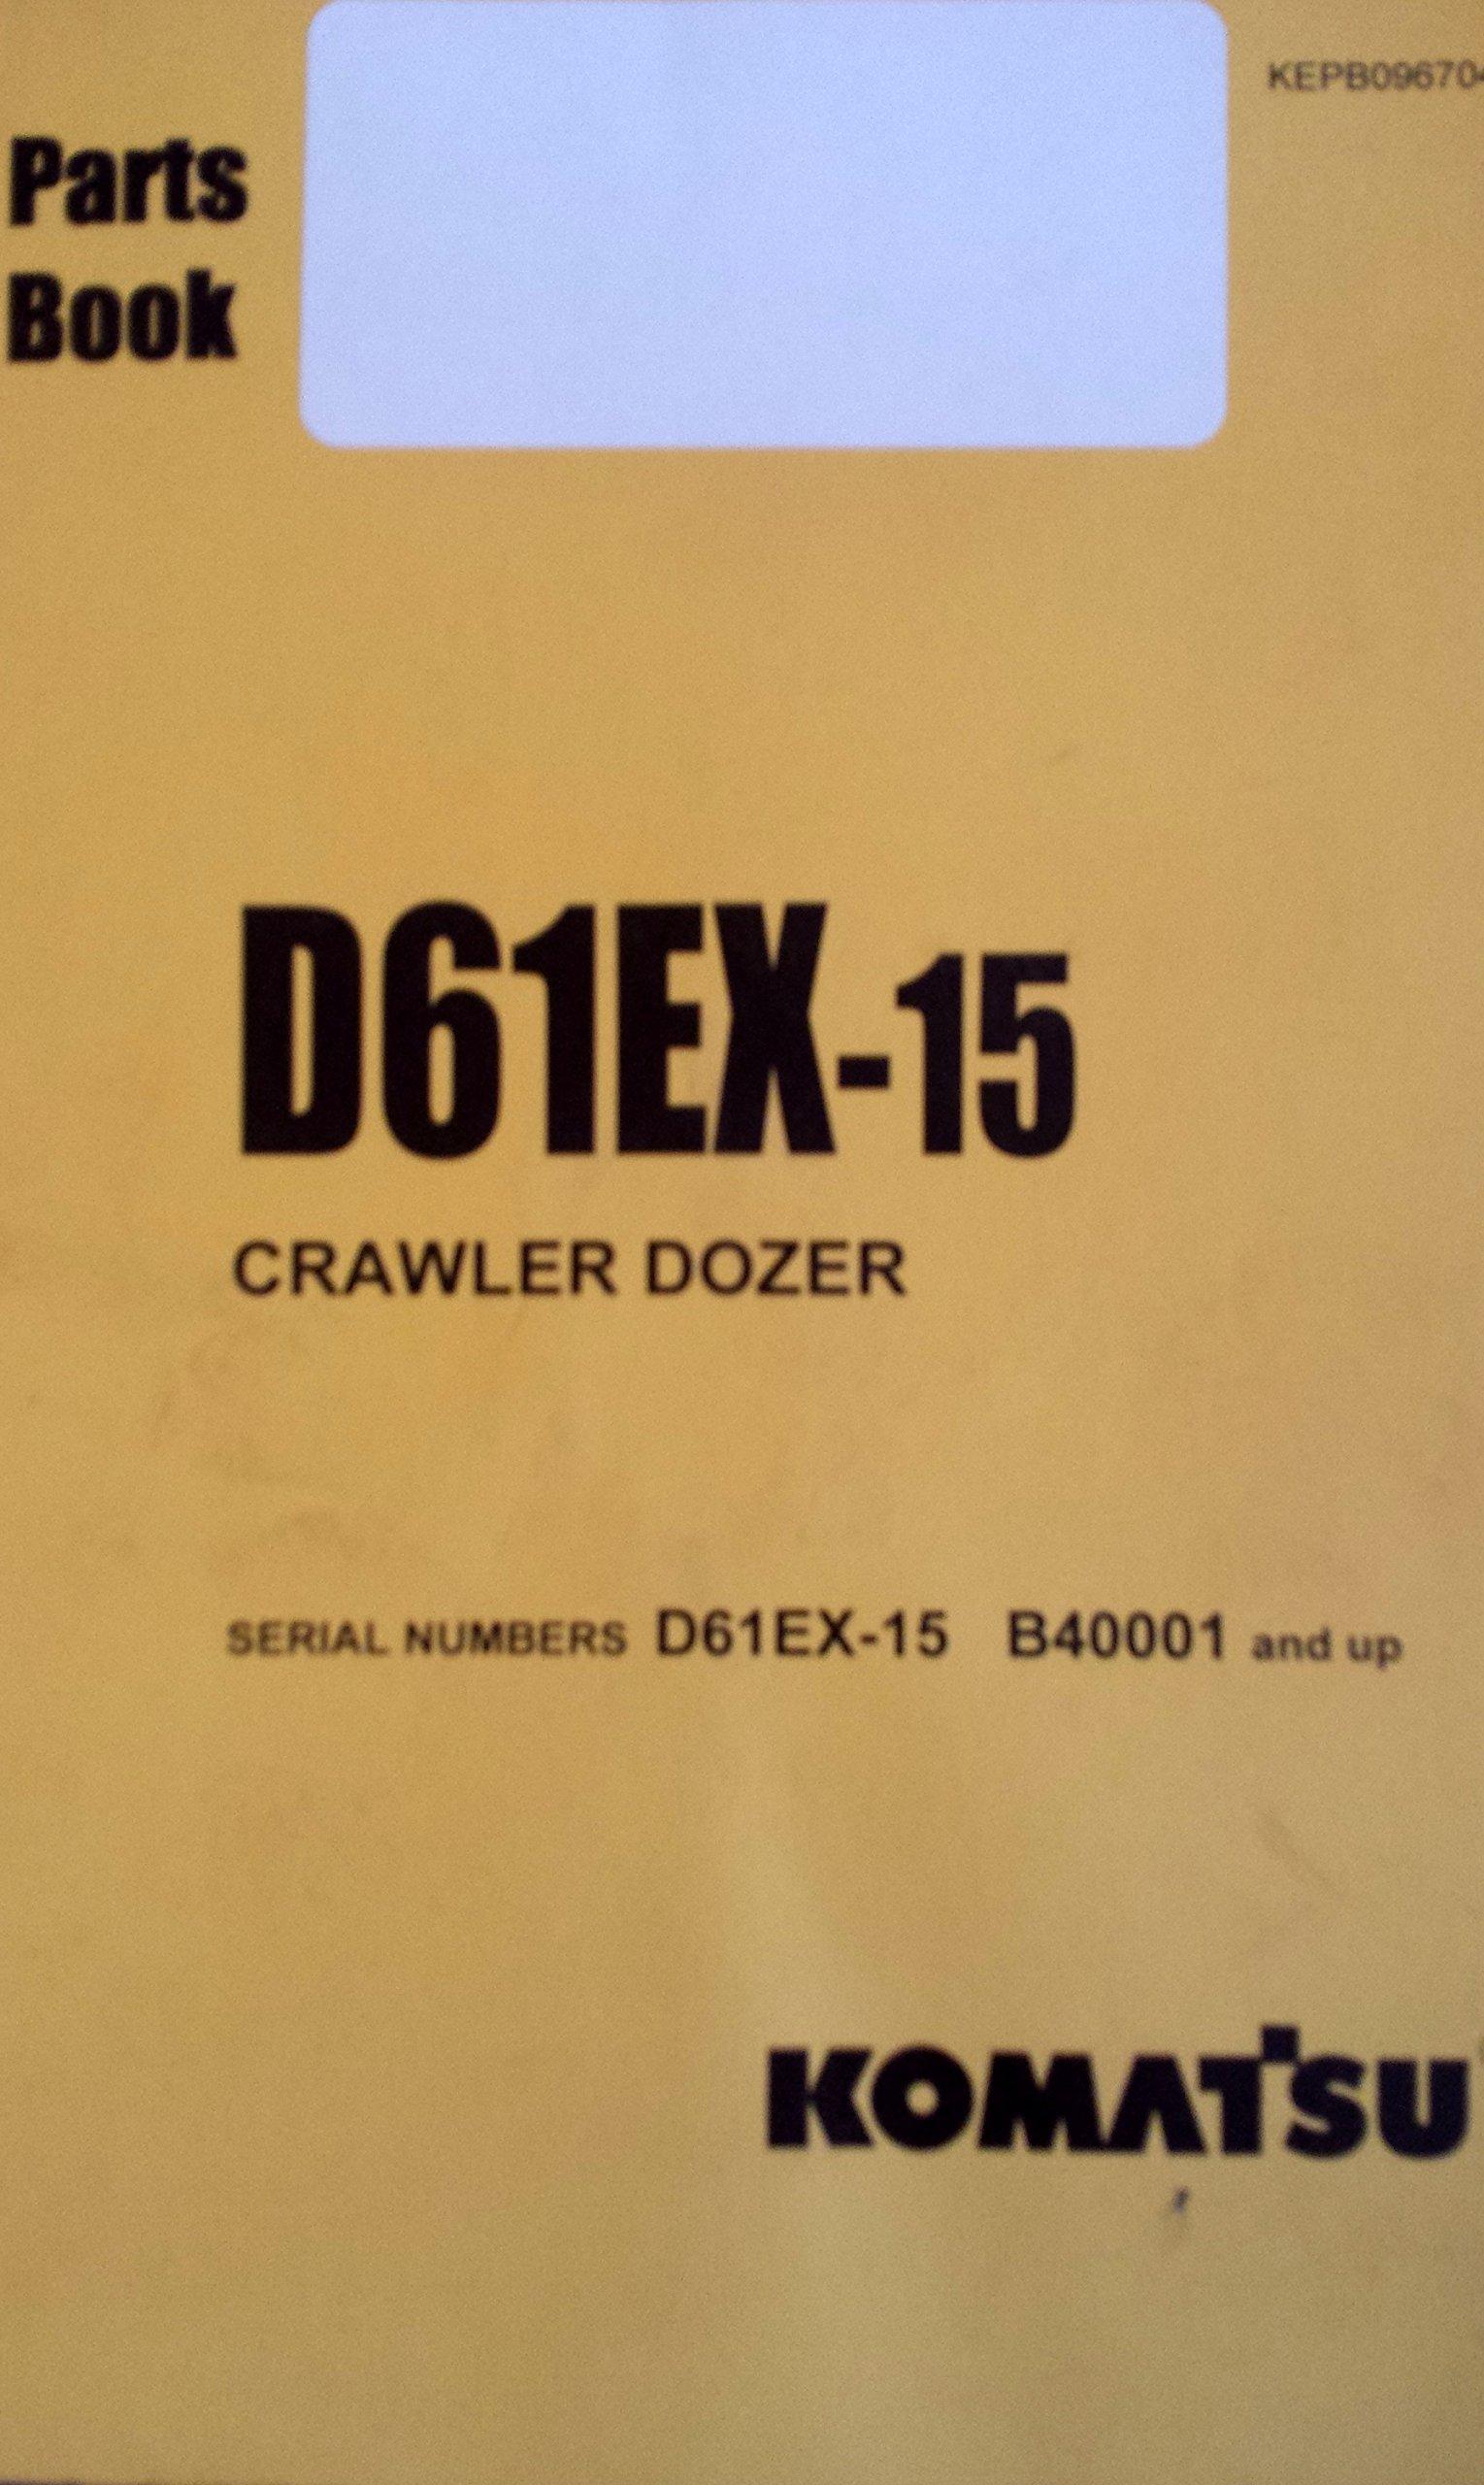 Komatsu D61EX-15 Crawler Dozer Parts Manual: Komatsu: 0730347164300